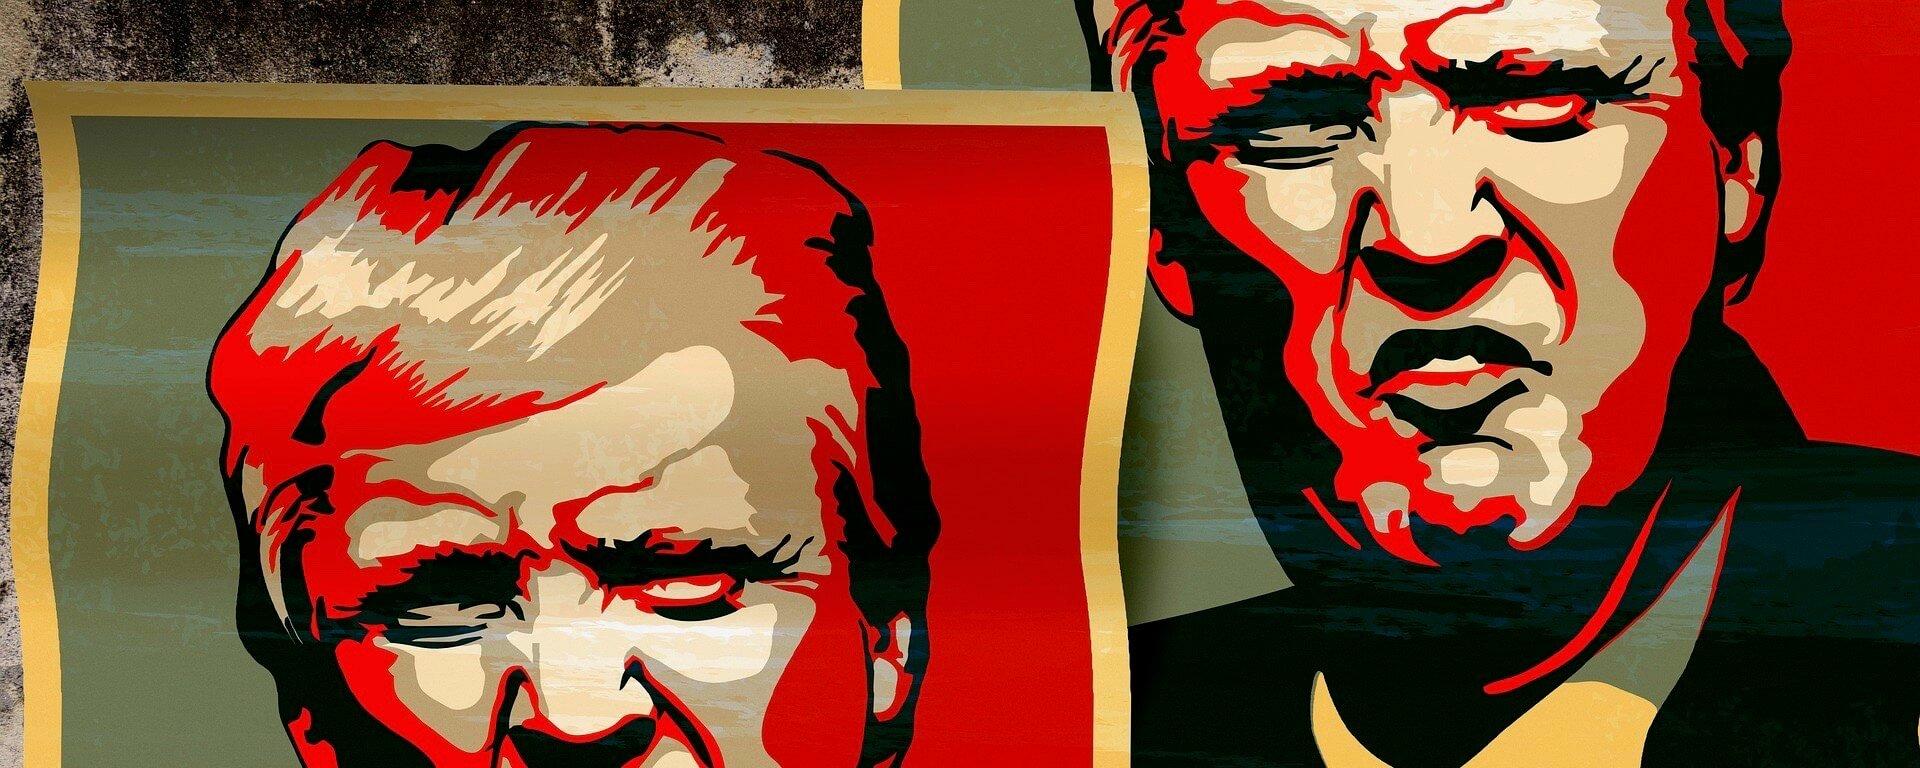 How To Avoid a Trump PR Crisis.jpg